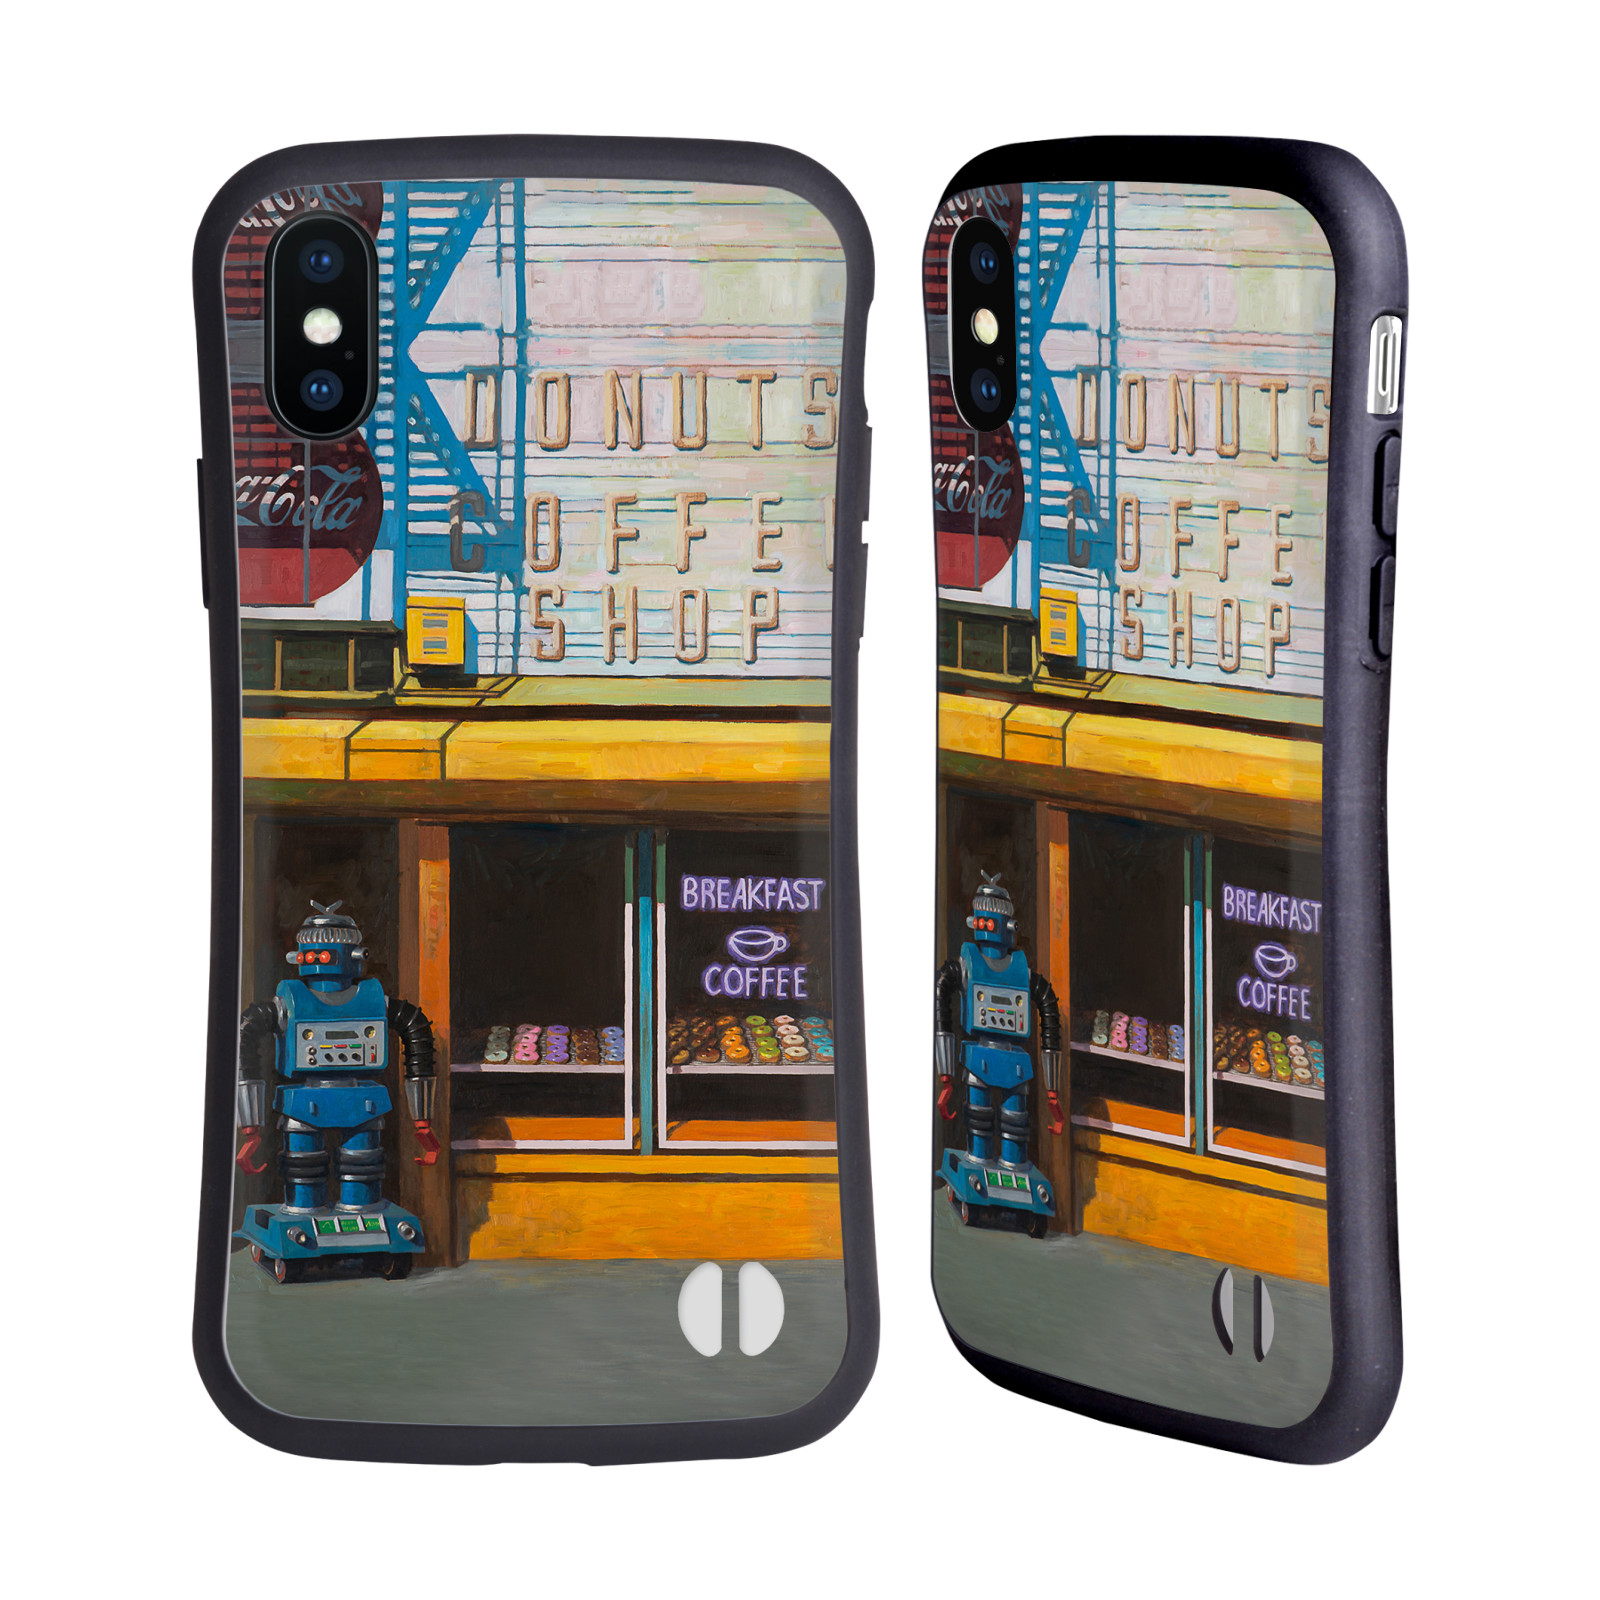 OFFICIAL-ERIC-JOYNER-ROBO-SHOP-HYBRID-CASE-FOR-APPLE-iPHONES-PHONES